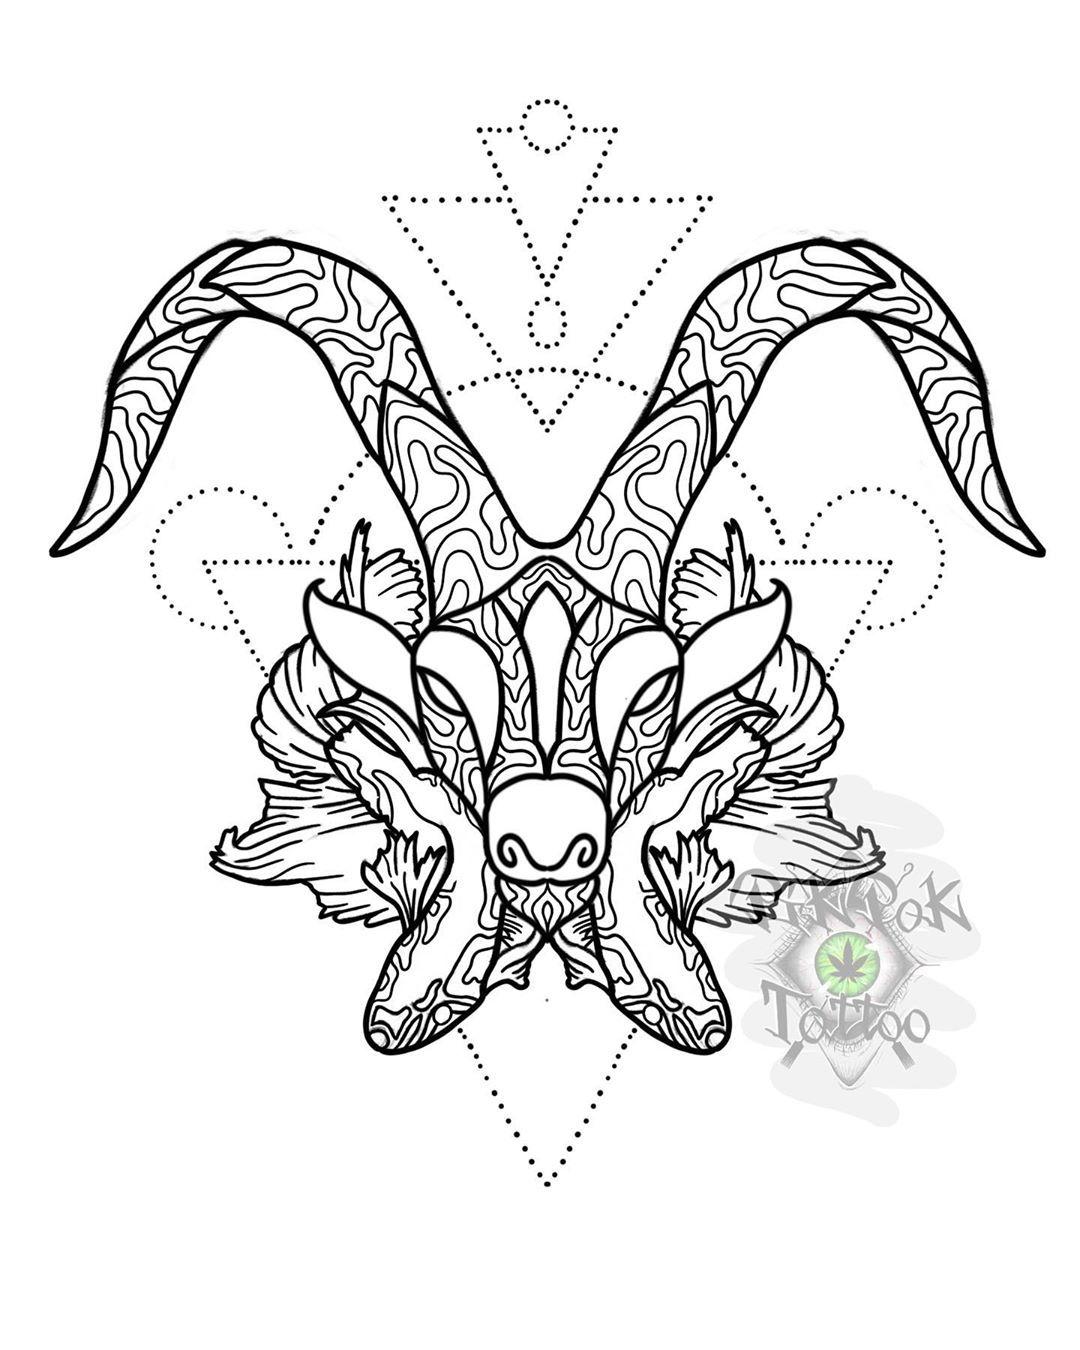 Kolejny projekt do zgarnięcia zapraszam do zapisów  #tattoo_witryna #tattoo_witryna #tattoo #geometrictattoo #blackwork #fish #fishtattoo #f4f #l4l #poznań #polishtattoo #polandtattoos #ktosieniedziaratenfujara #pikpokart  Follow me and my friends  @locotattooart  @przystawsiedotreningu  @pikpok_tattoo